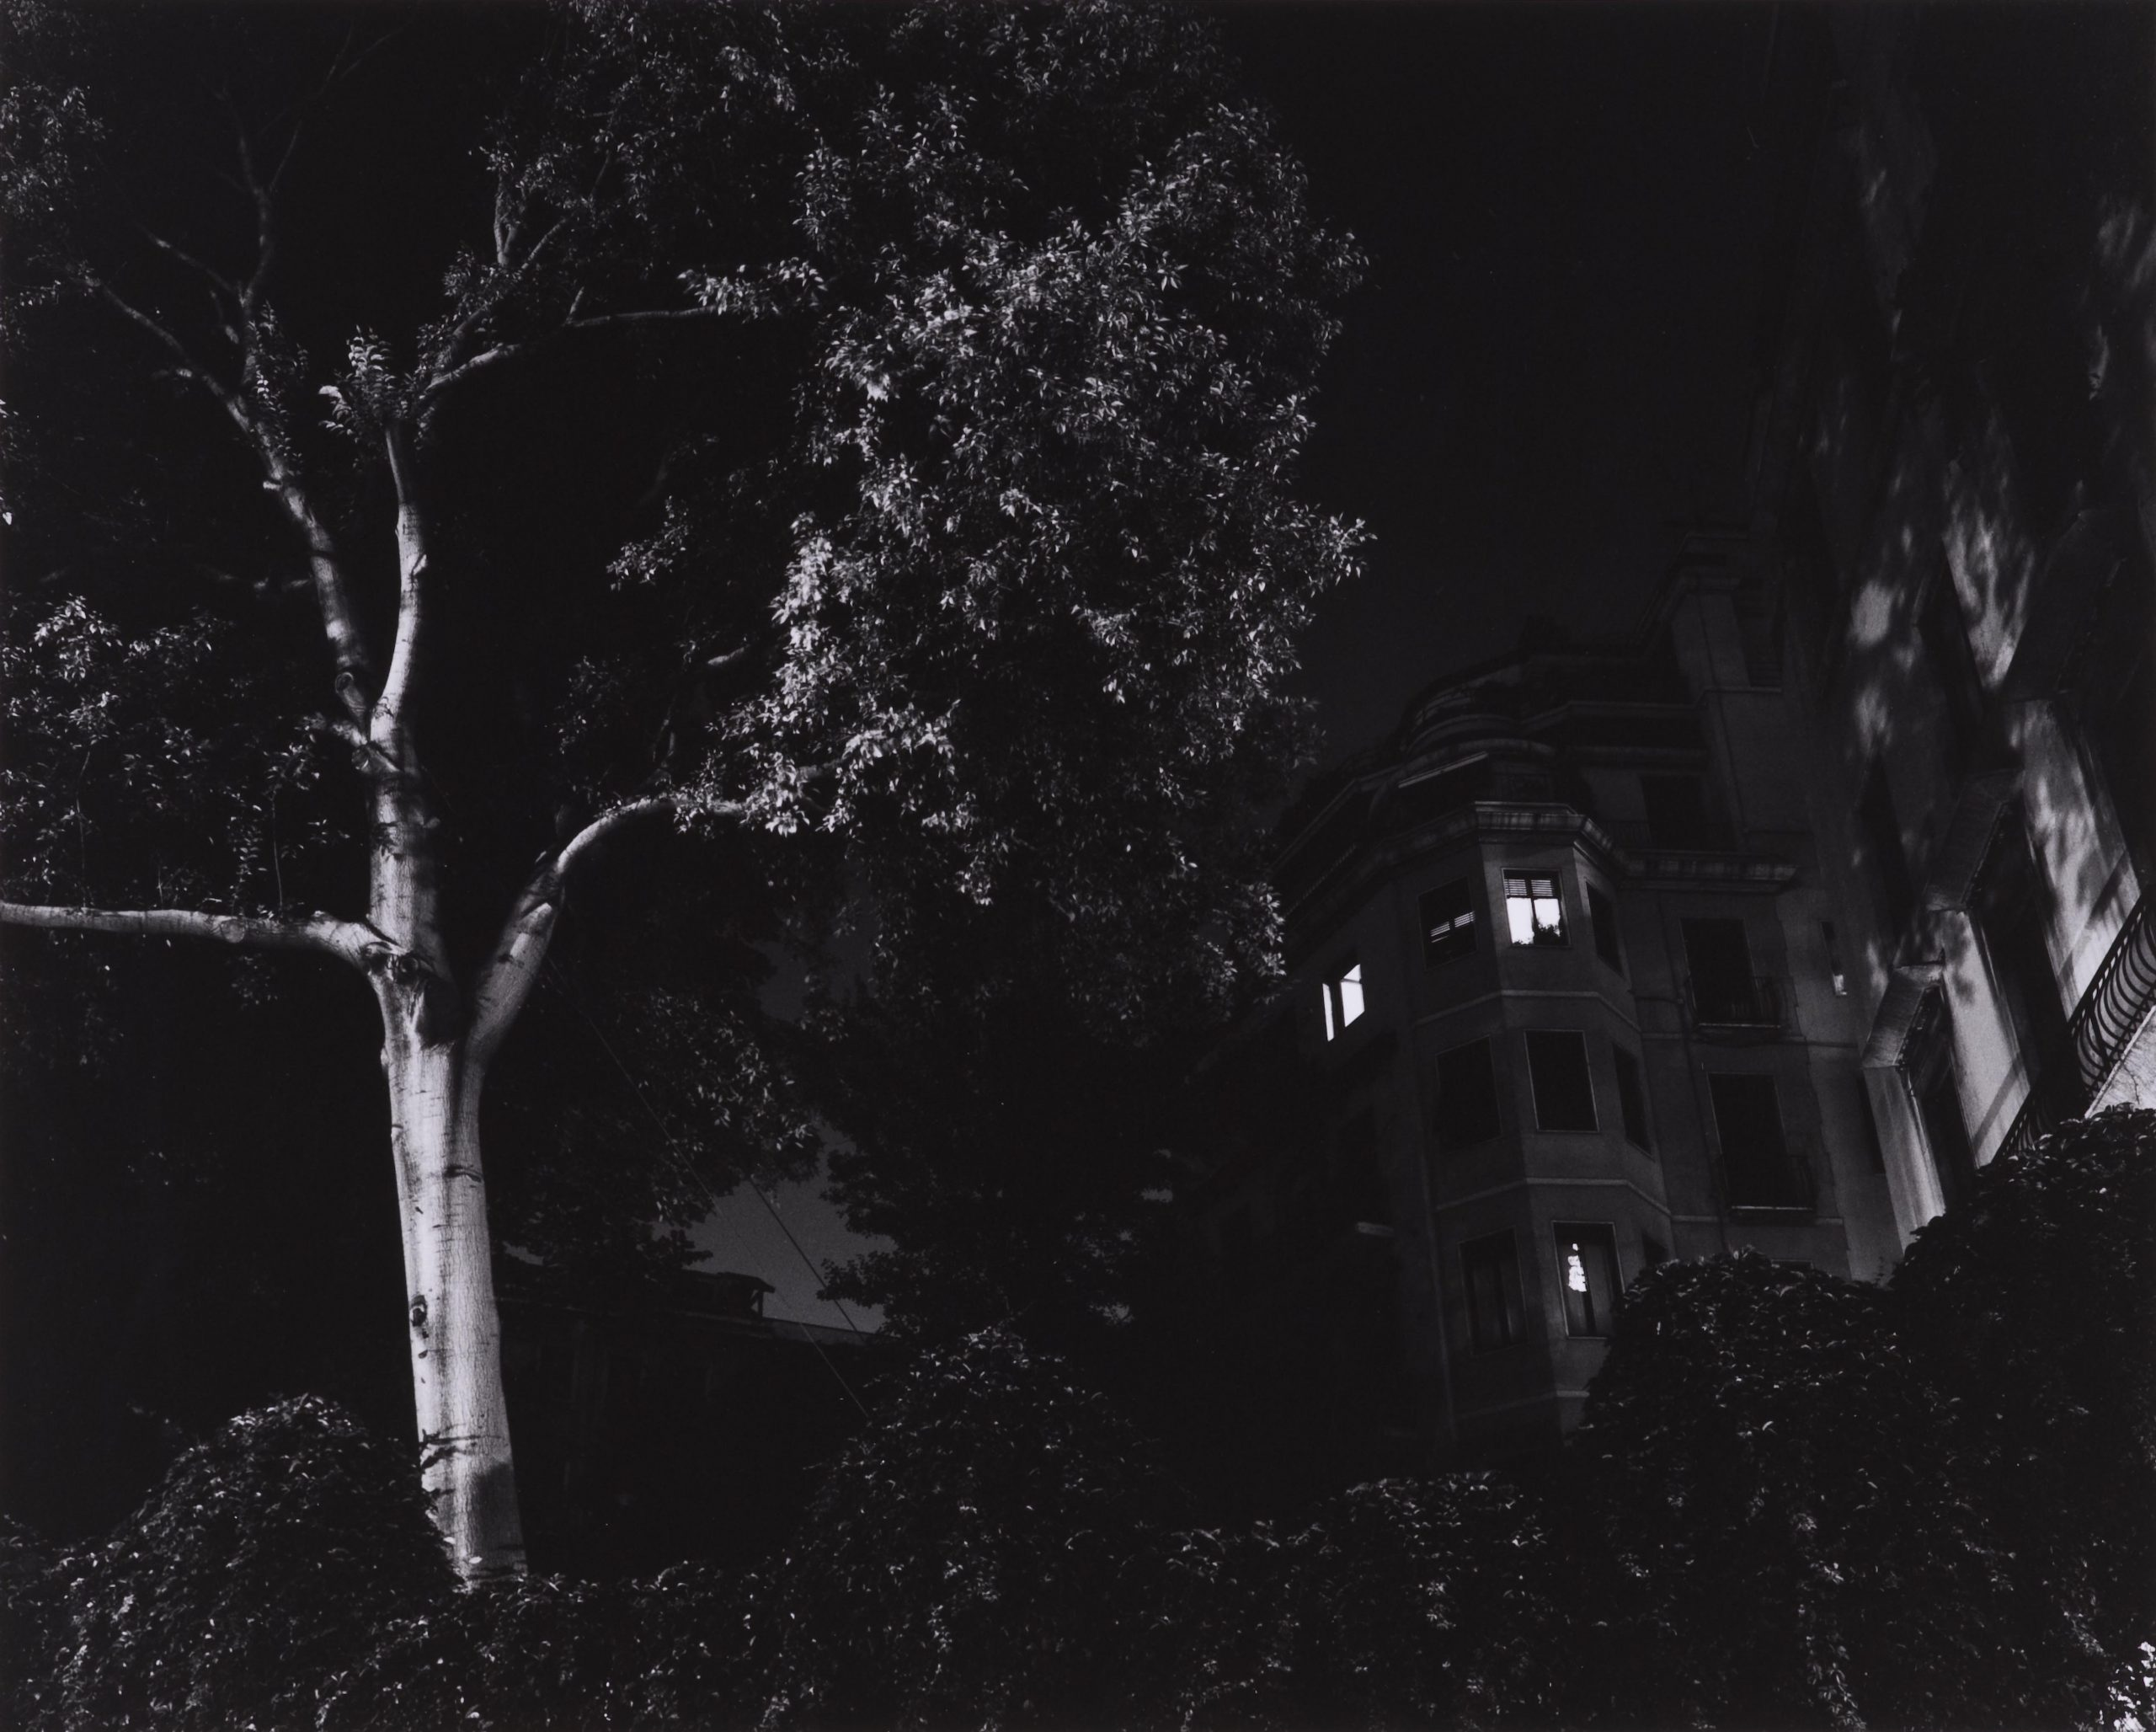 Basilico, Gabriele 26